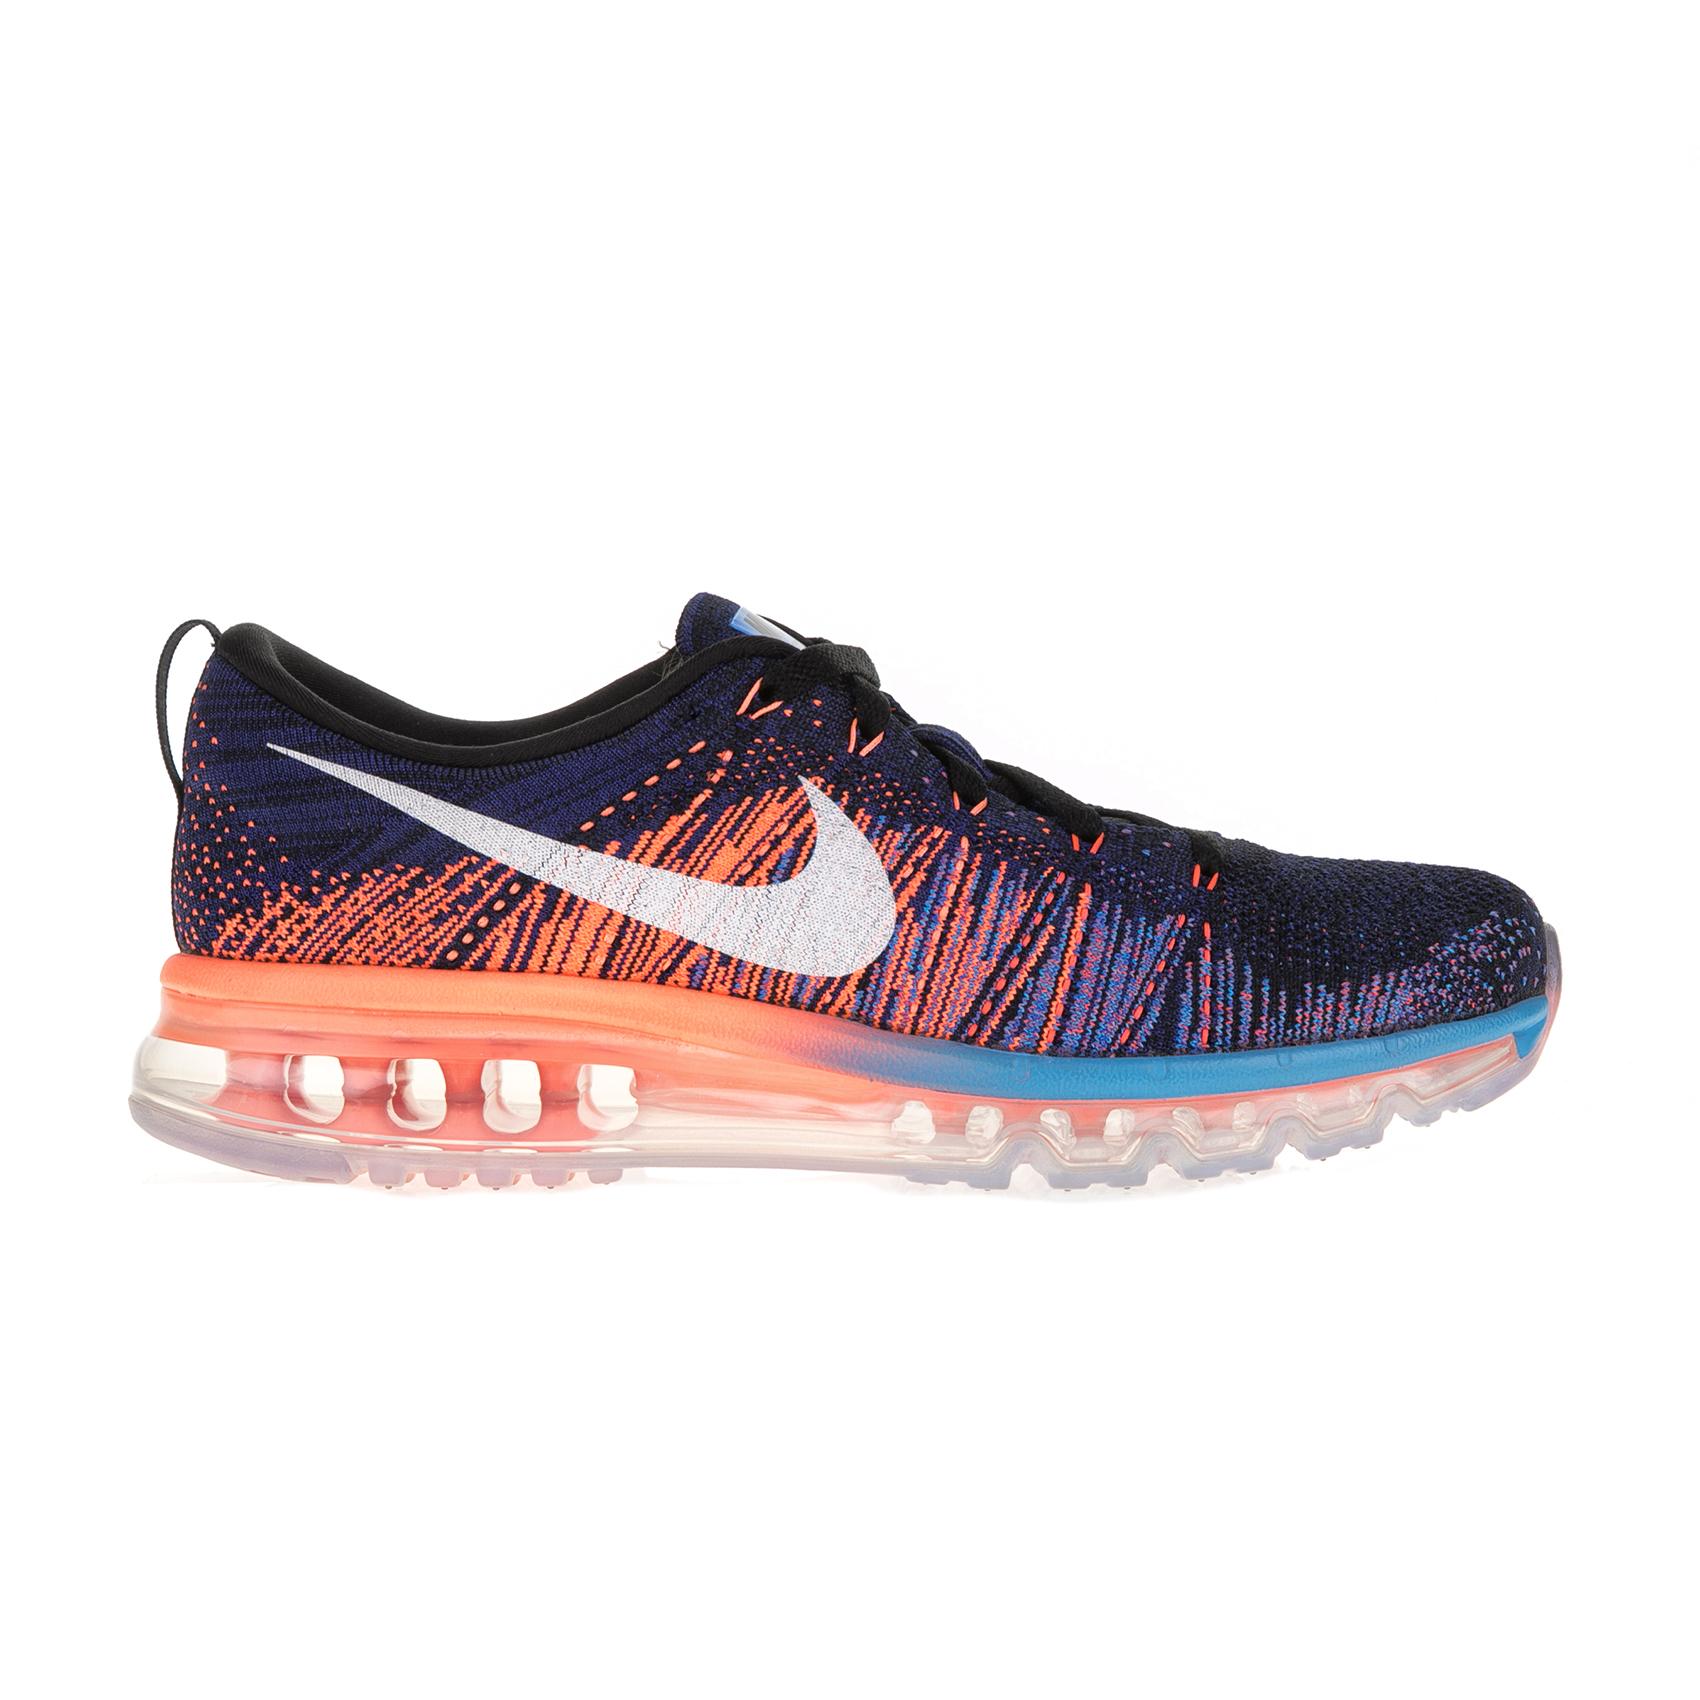 NIKE – Ανδρικά αθλητικά παπούτσια Nike FLYKNIT MAX μπλε – πορτοκαλί